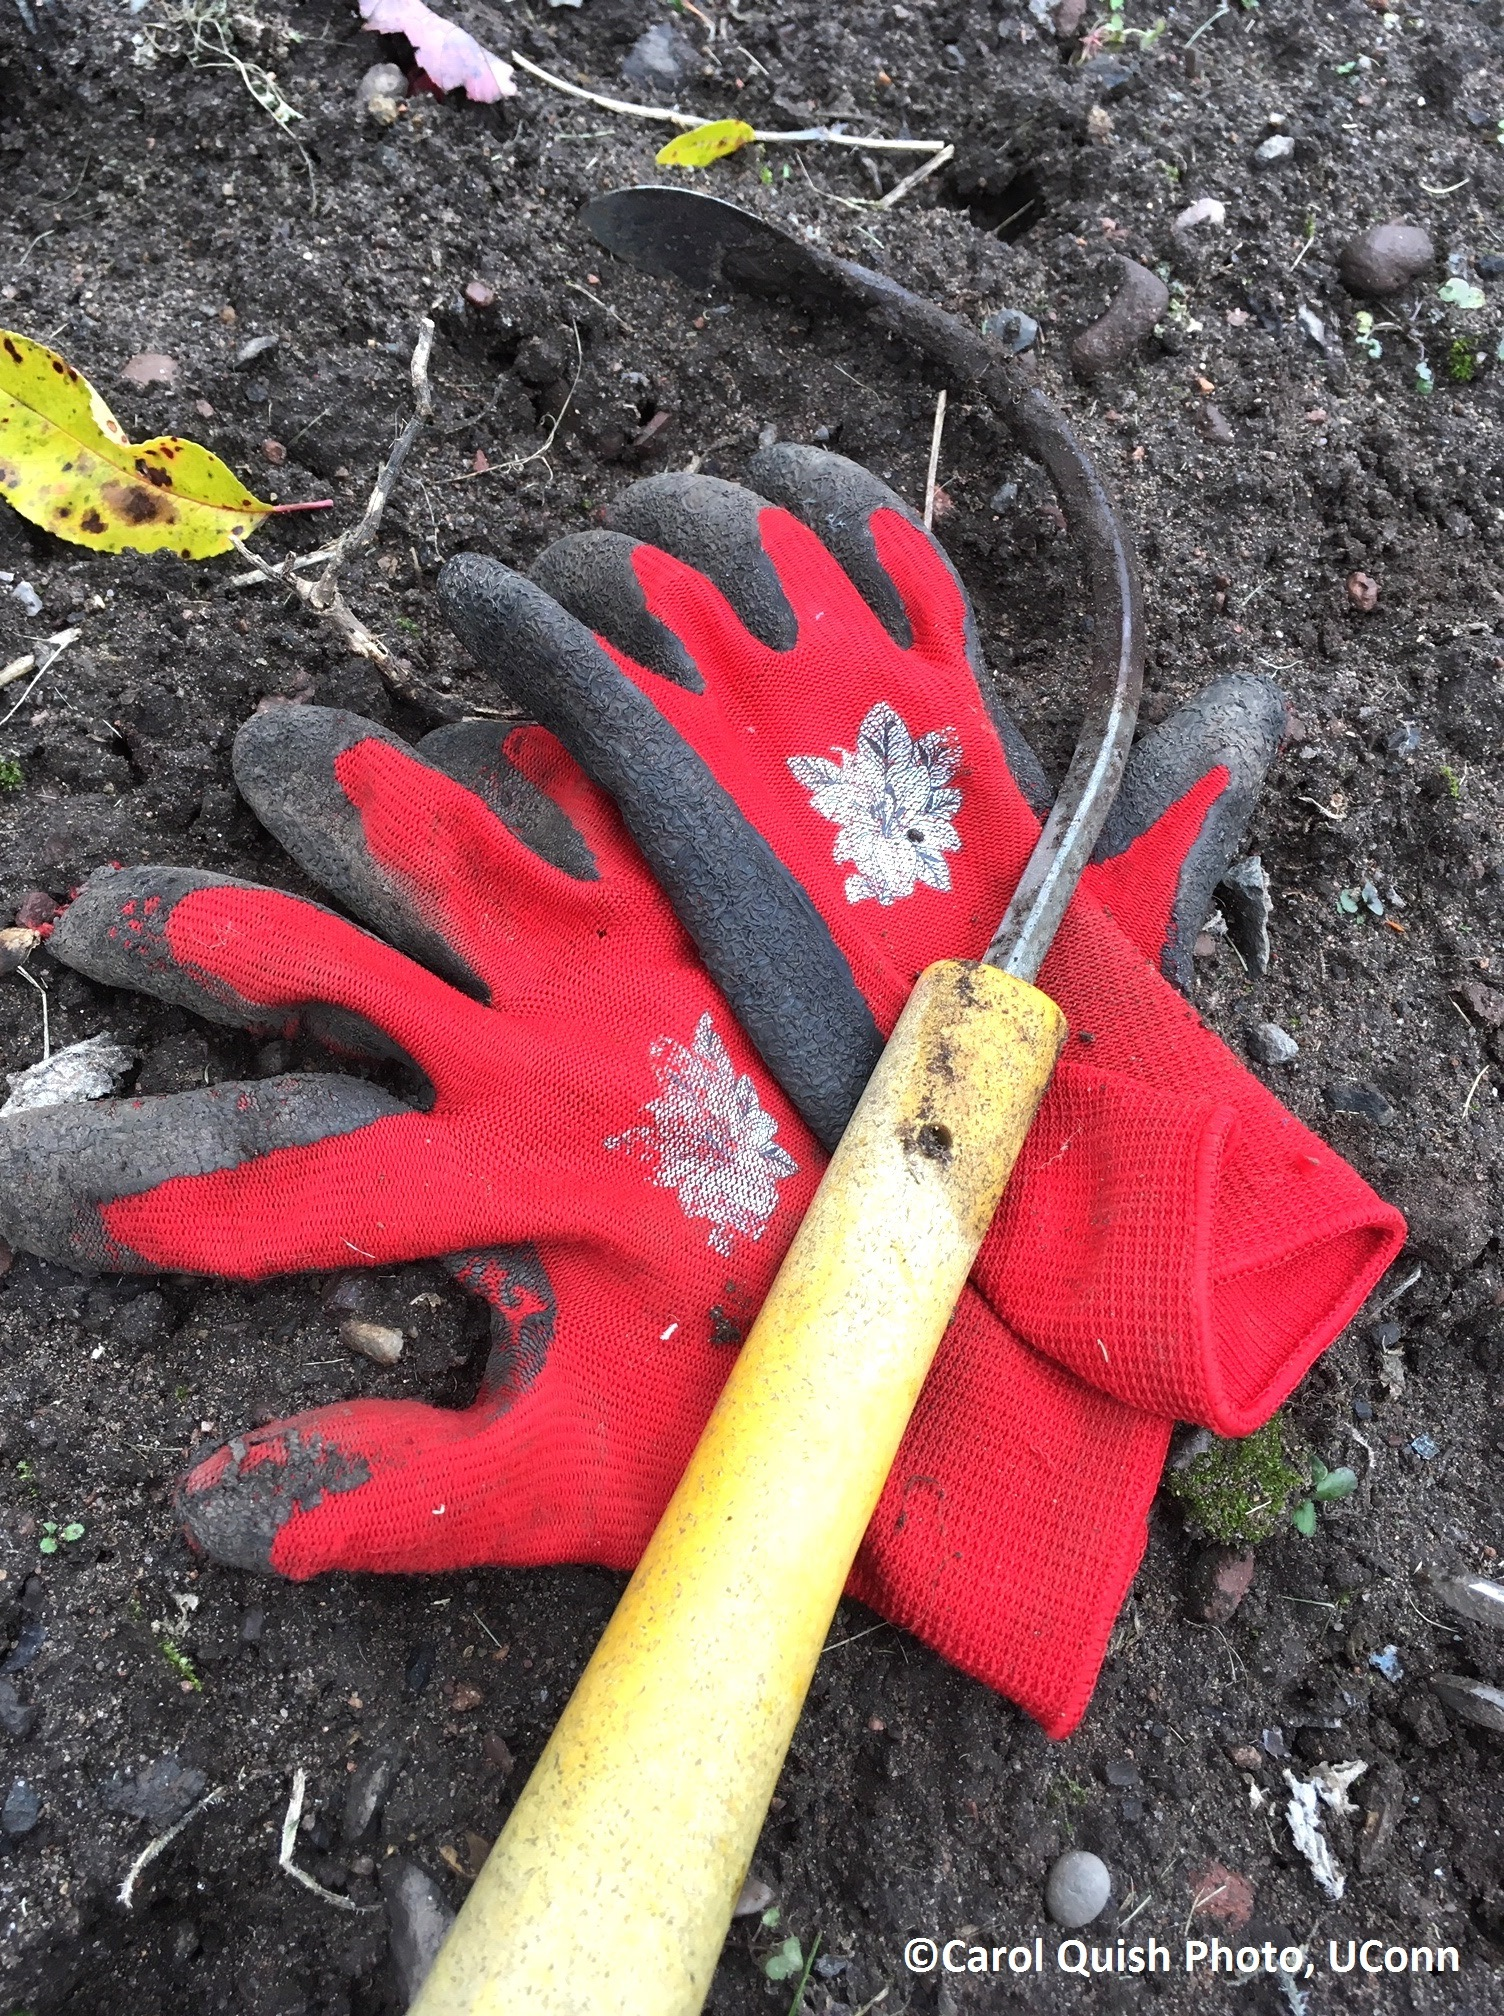 cobrahead weeder and red gloves